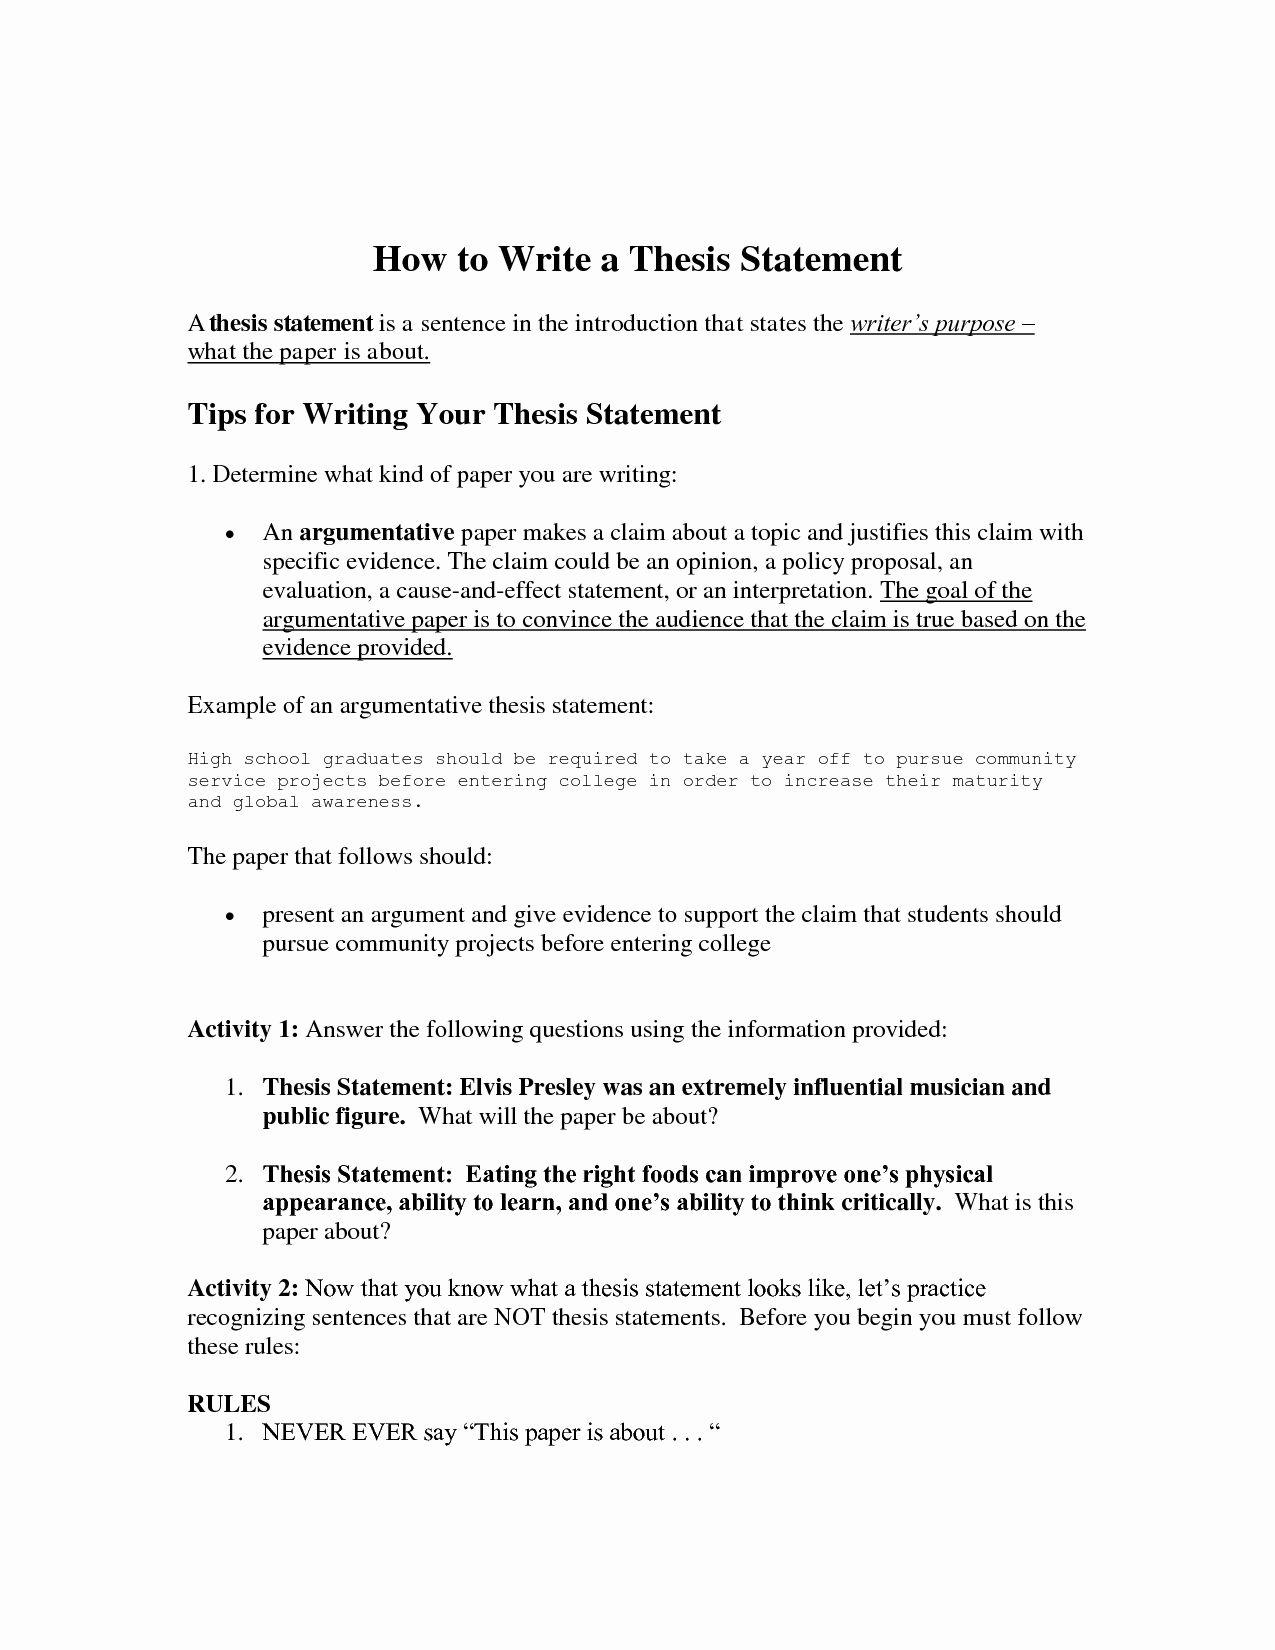 Thesi Statement Practice Worksheet Elegant 39 Example Of Chessmuseum Templa Writing A Examples Interpretation Essay